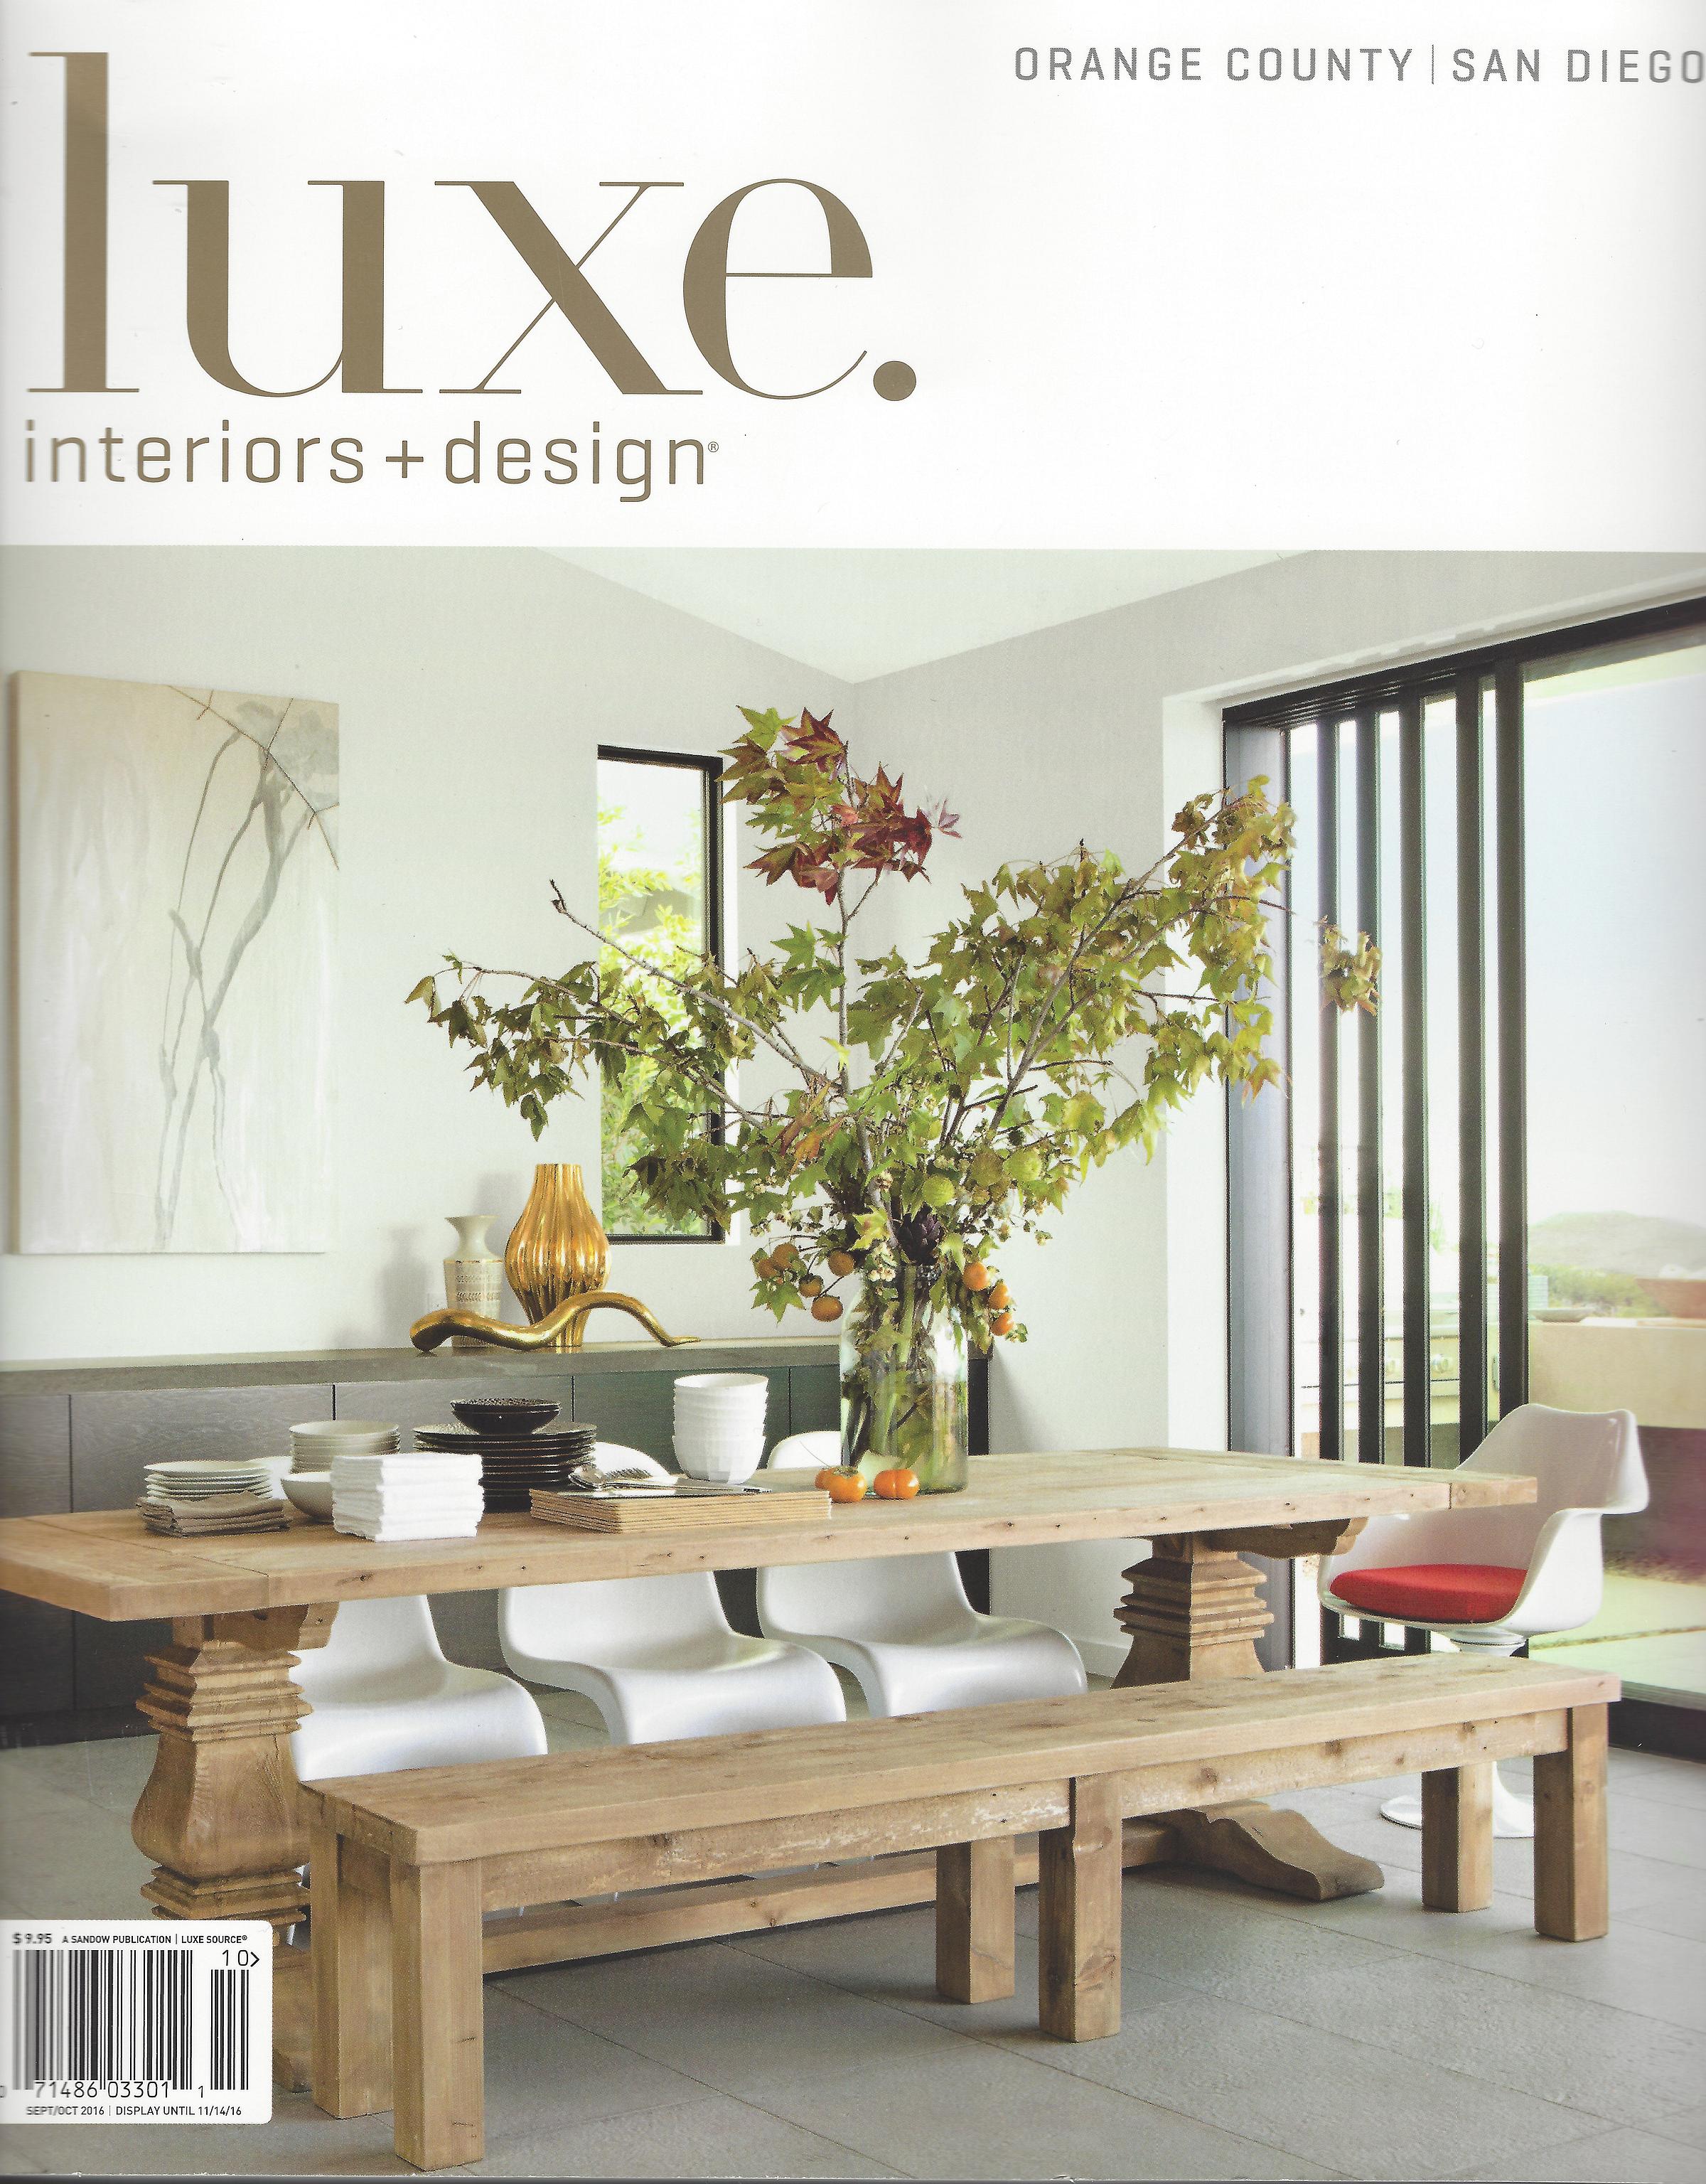 Luxe Interiors + Design Magazine San Diego Orange County